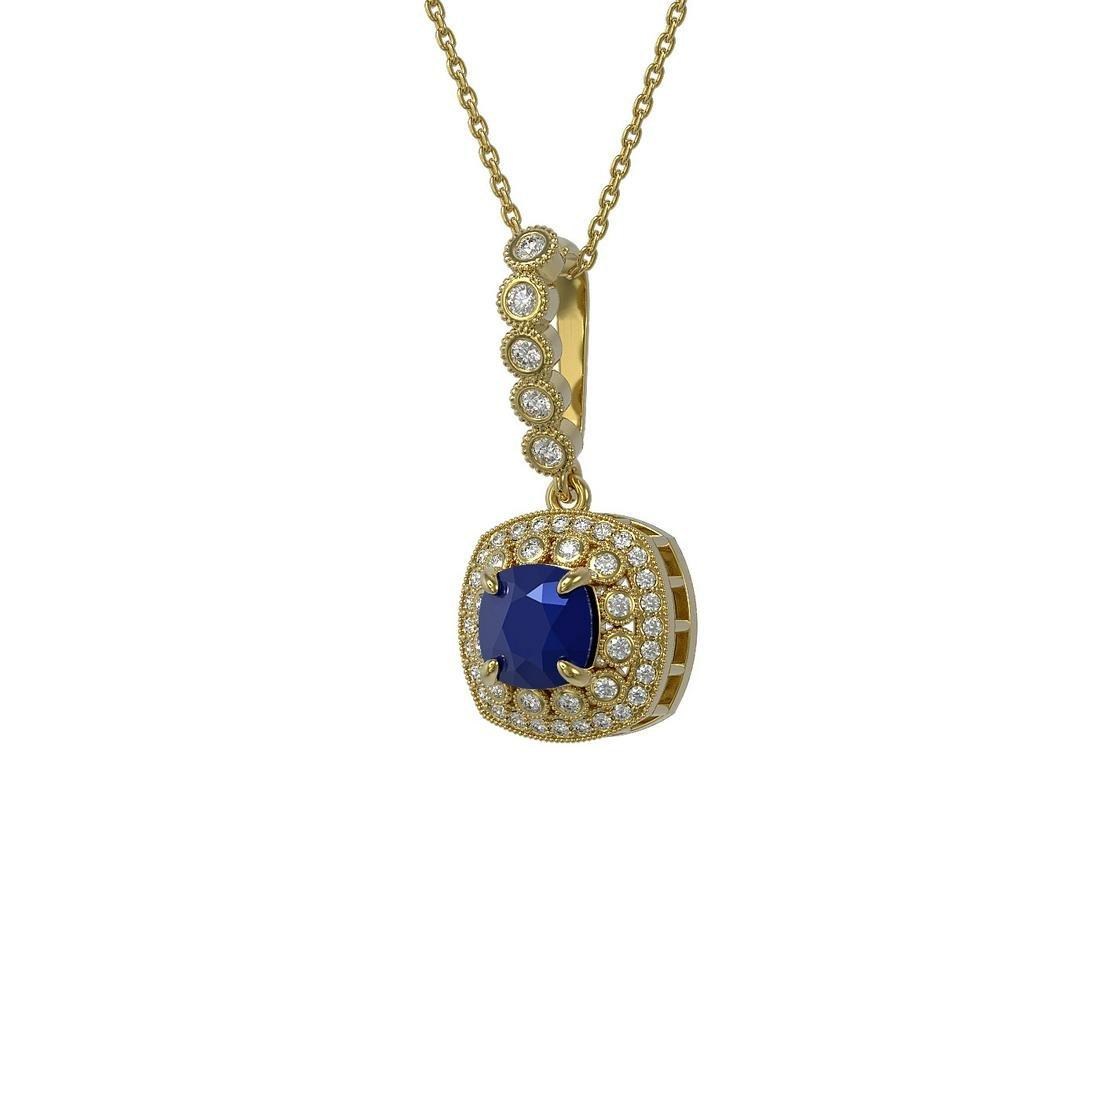 2.55 ctw Sapphire & Diamond Necklace 14K Yellow Gold